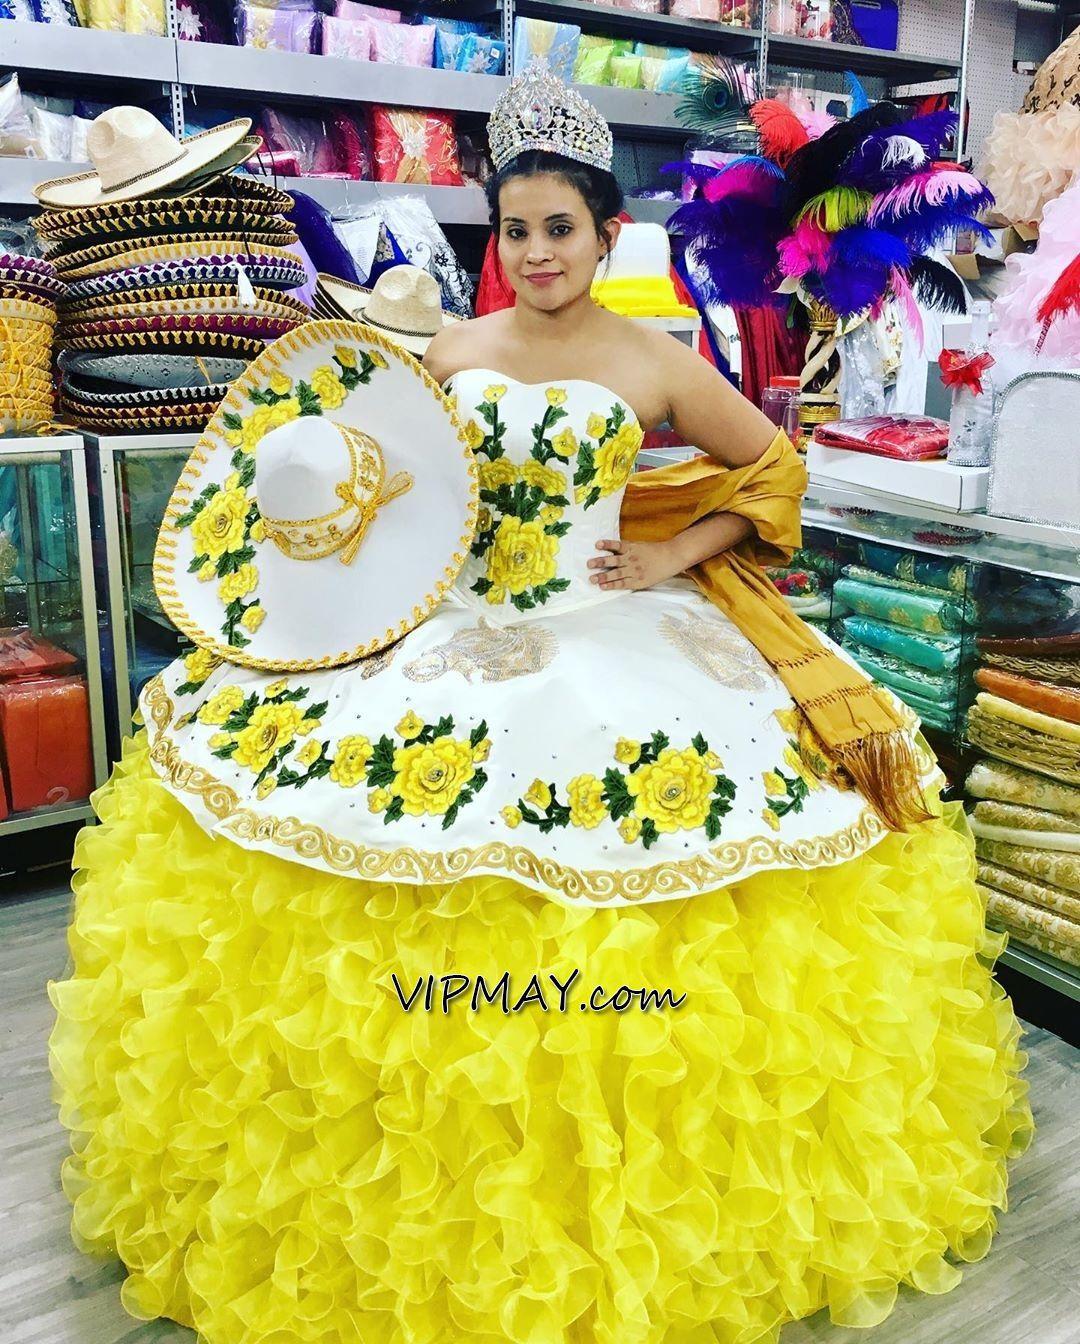 bright yellow quinceanera dress,quinceanera dress charro style,charro collection quinceanera dress,3d floral applique quinceanera dress,quinceanera dress with ruffles,girls wearing quinceanera dress,young girls dress for quinceanera,cowgirl quinceanera dress,